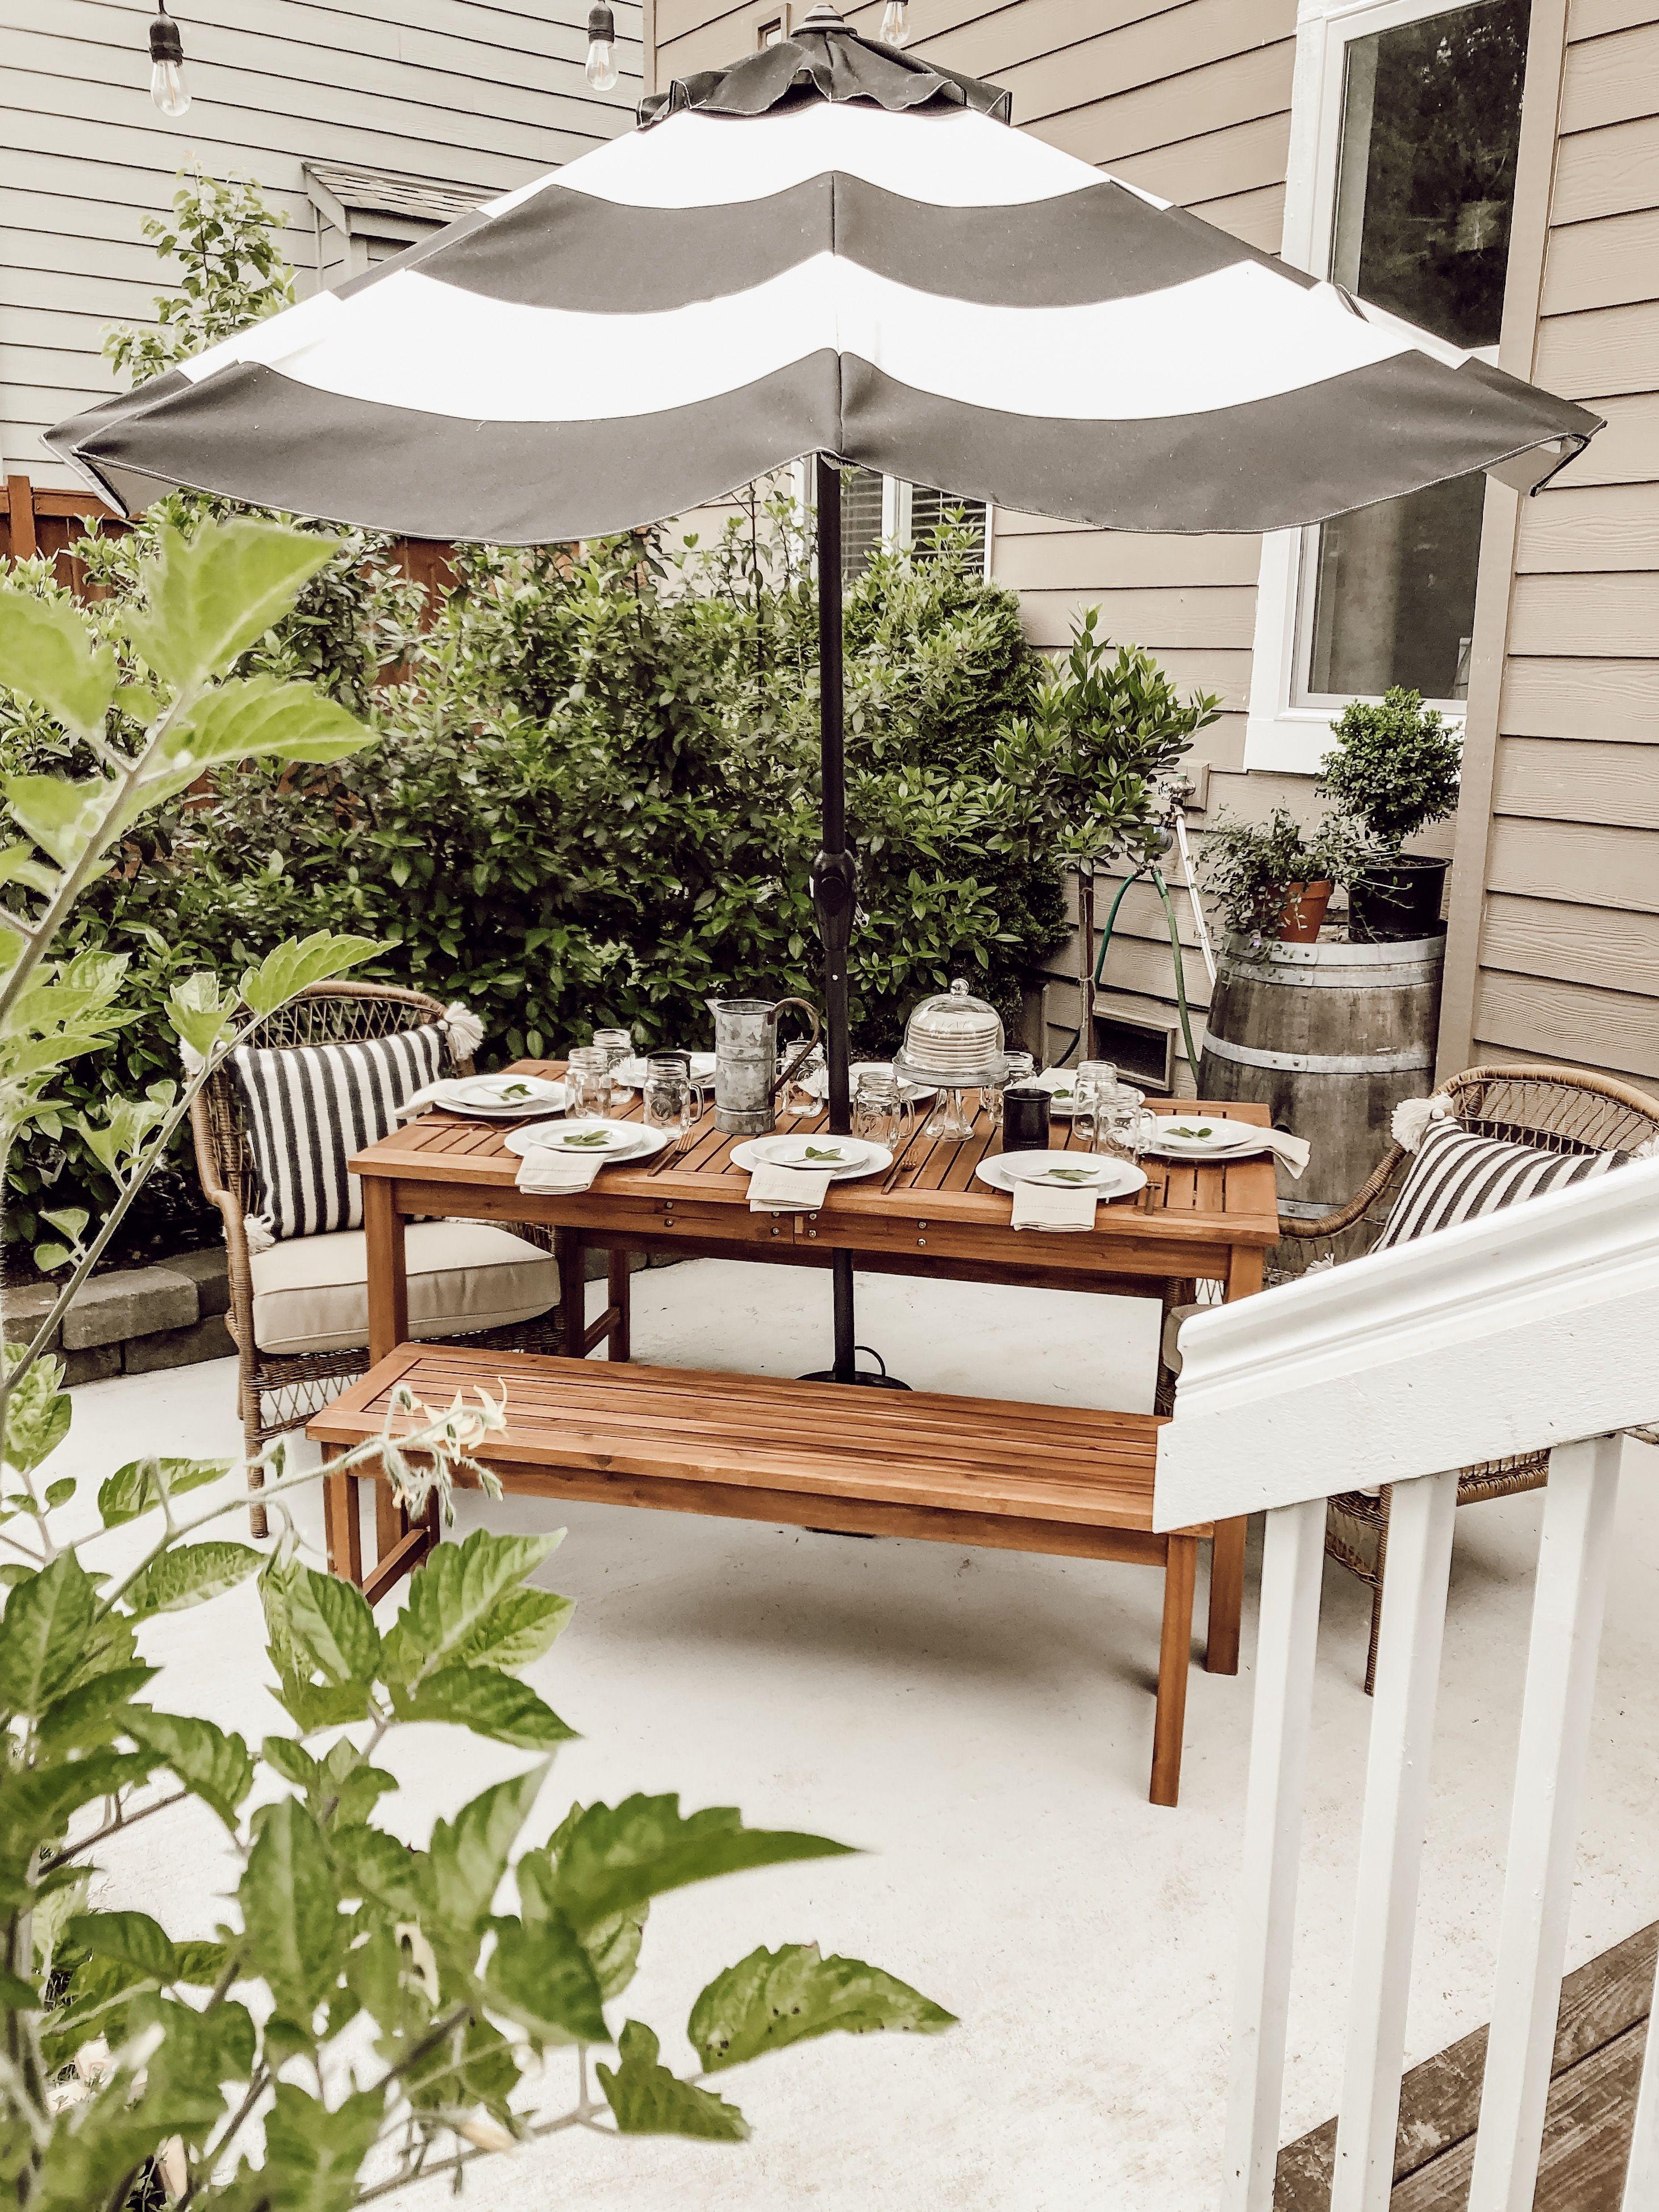 Patio Dining Sets With Umbrellas Decordip Com Outdoor Patio Set Patio Set With Umbrella Outdoor Patio Furniture Sets